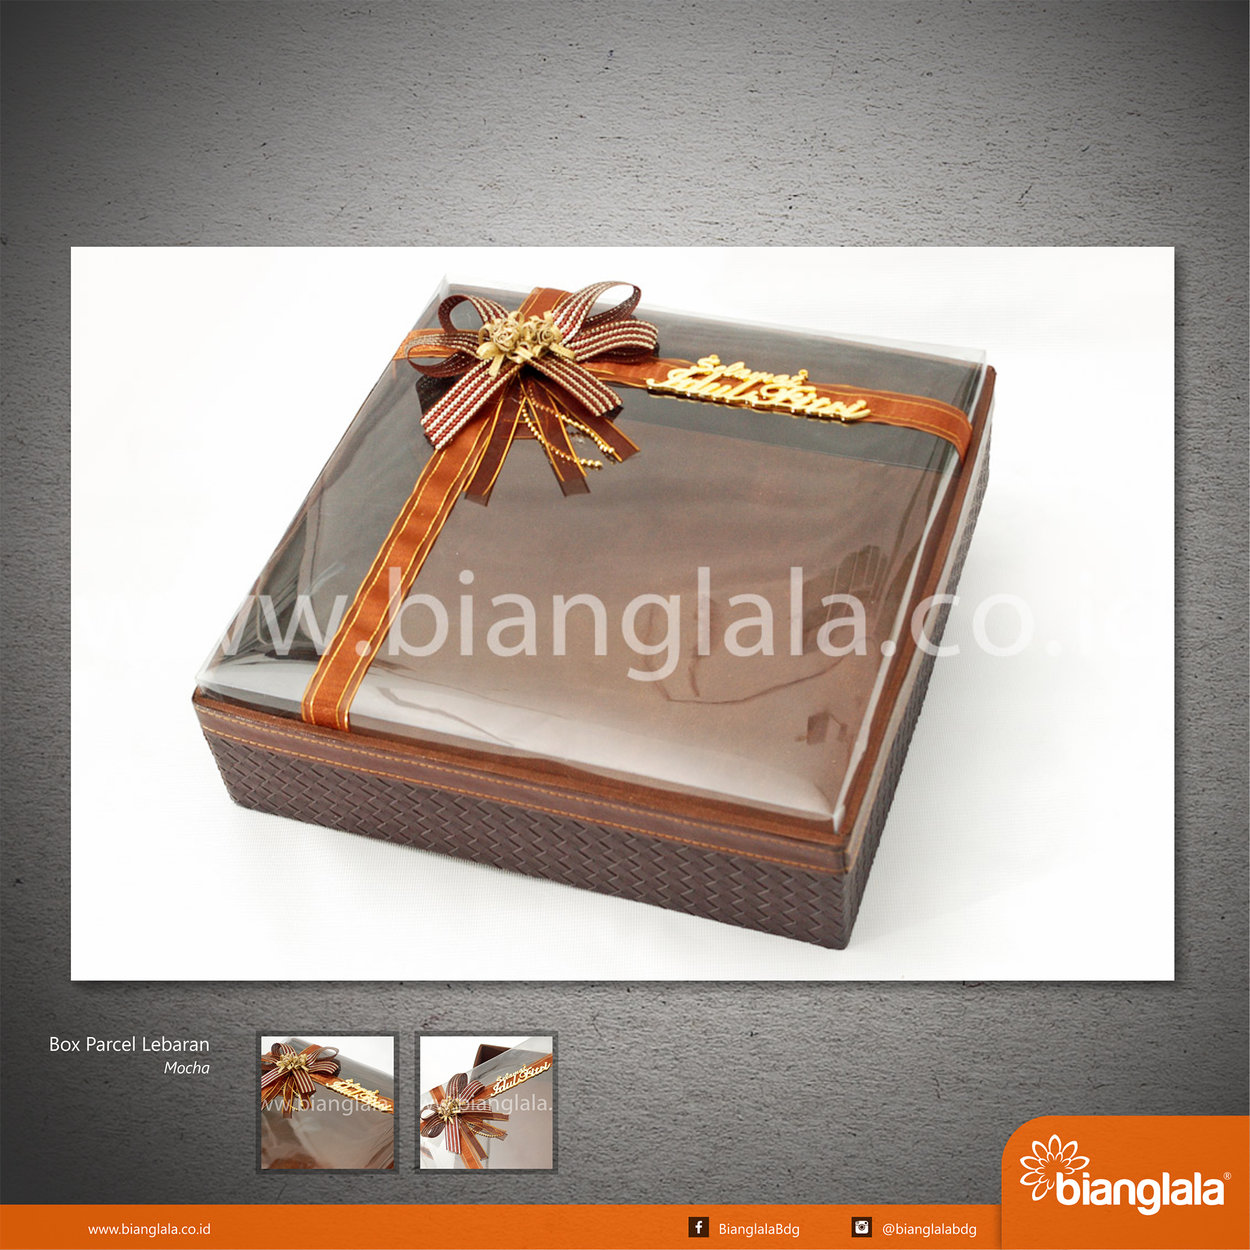 [01] Box Parcel Lebaran Mocha 1